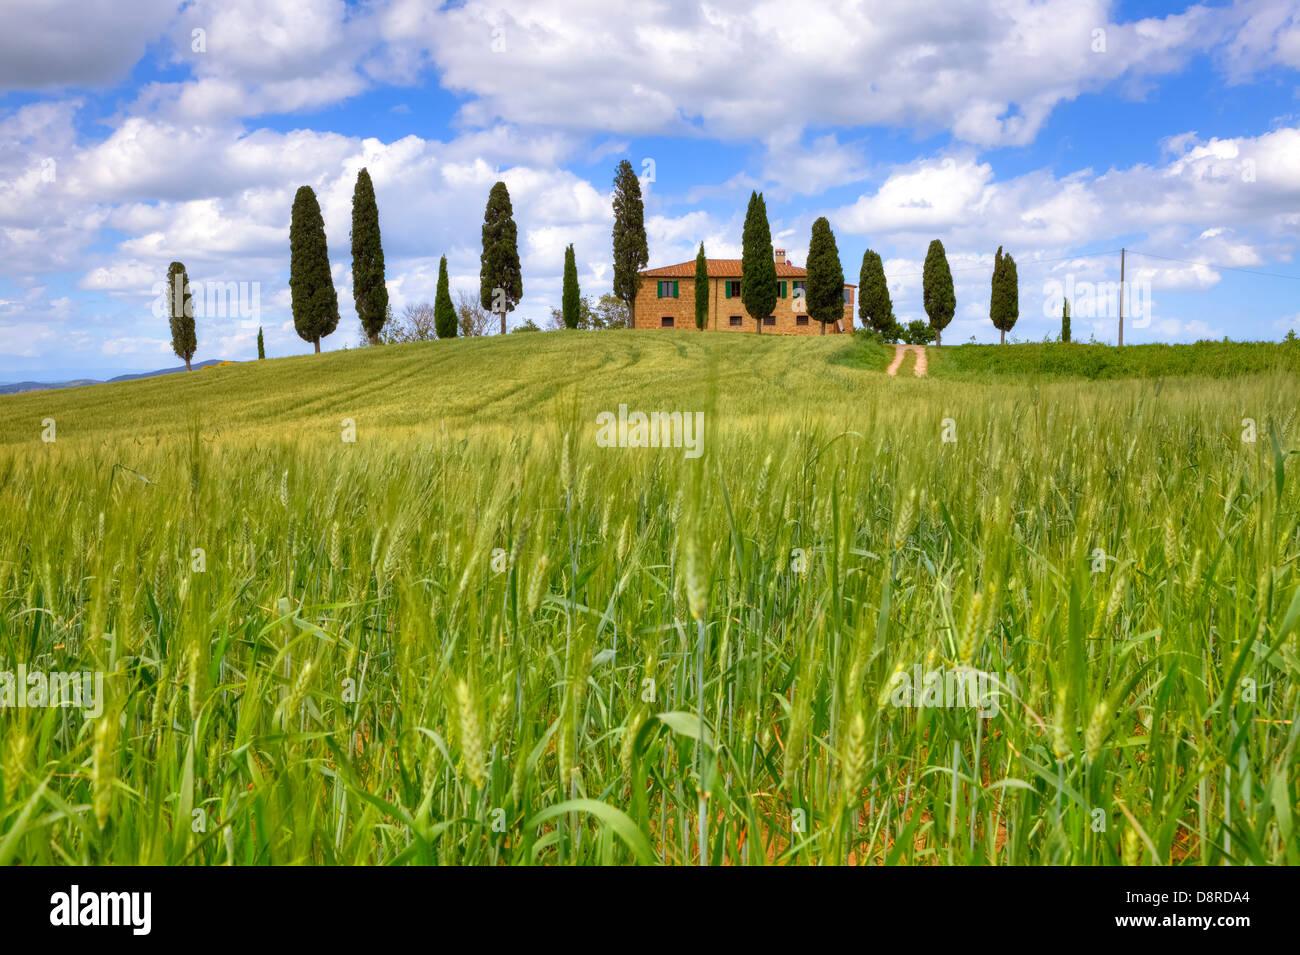 Casa de granja en Val d'Orcia, Pienza, Toscana, Italia Imagen De Stock